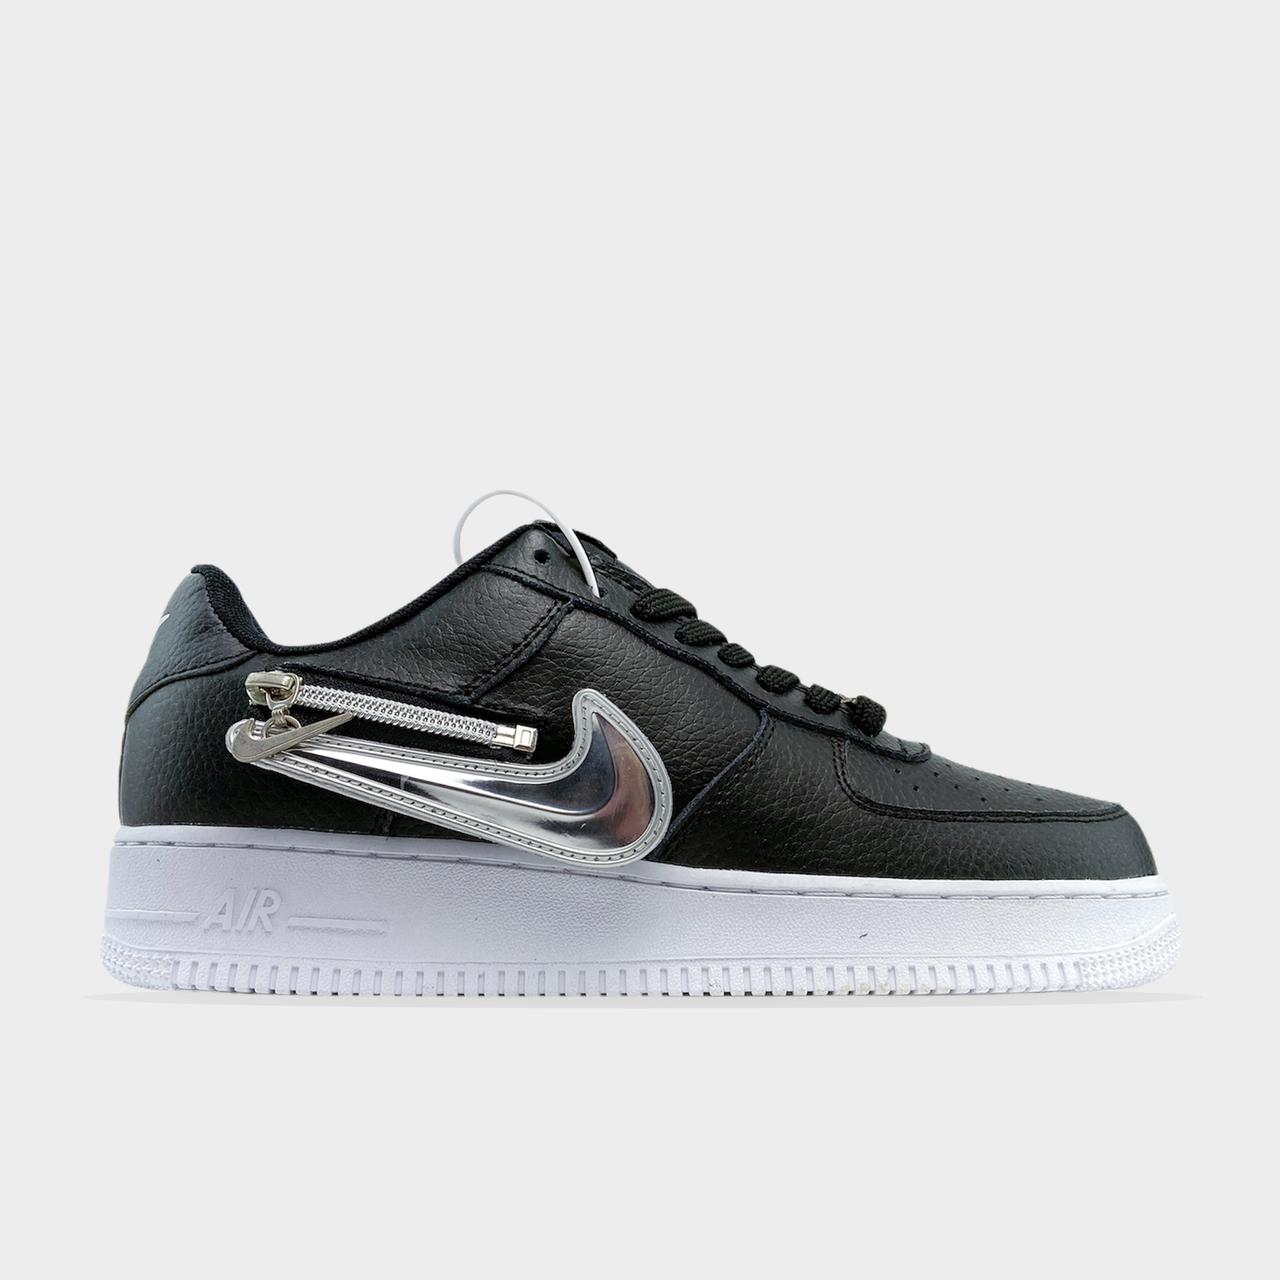 Nk, крос, обувь, взуття, sneakers, шузы, Air Force 1 Low Zip Swoosh black (Черный)